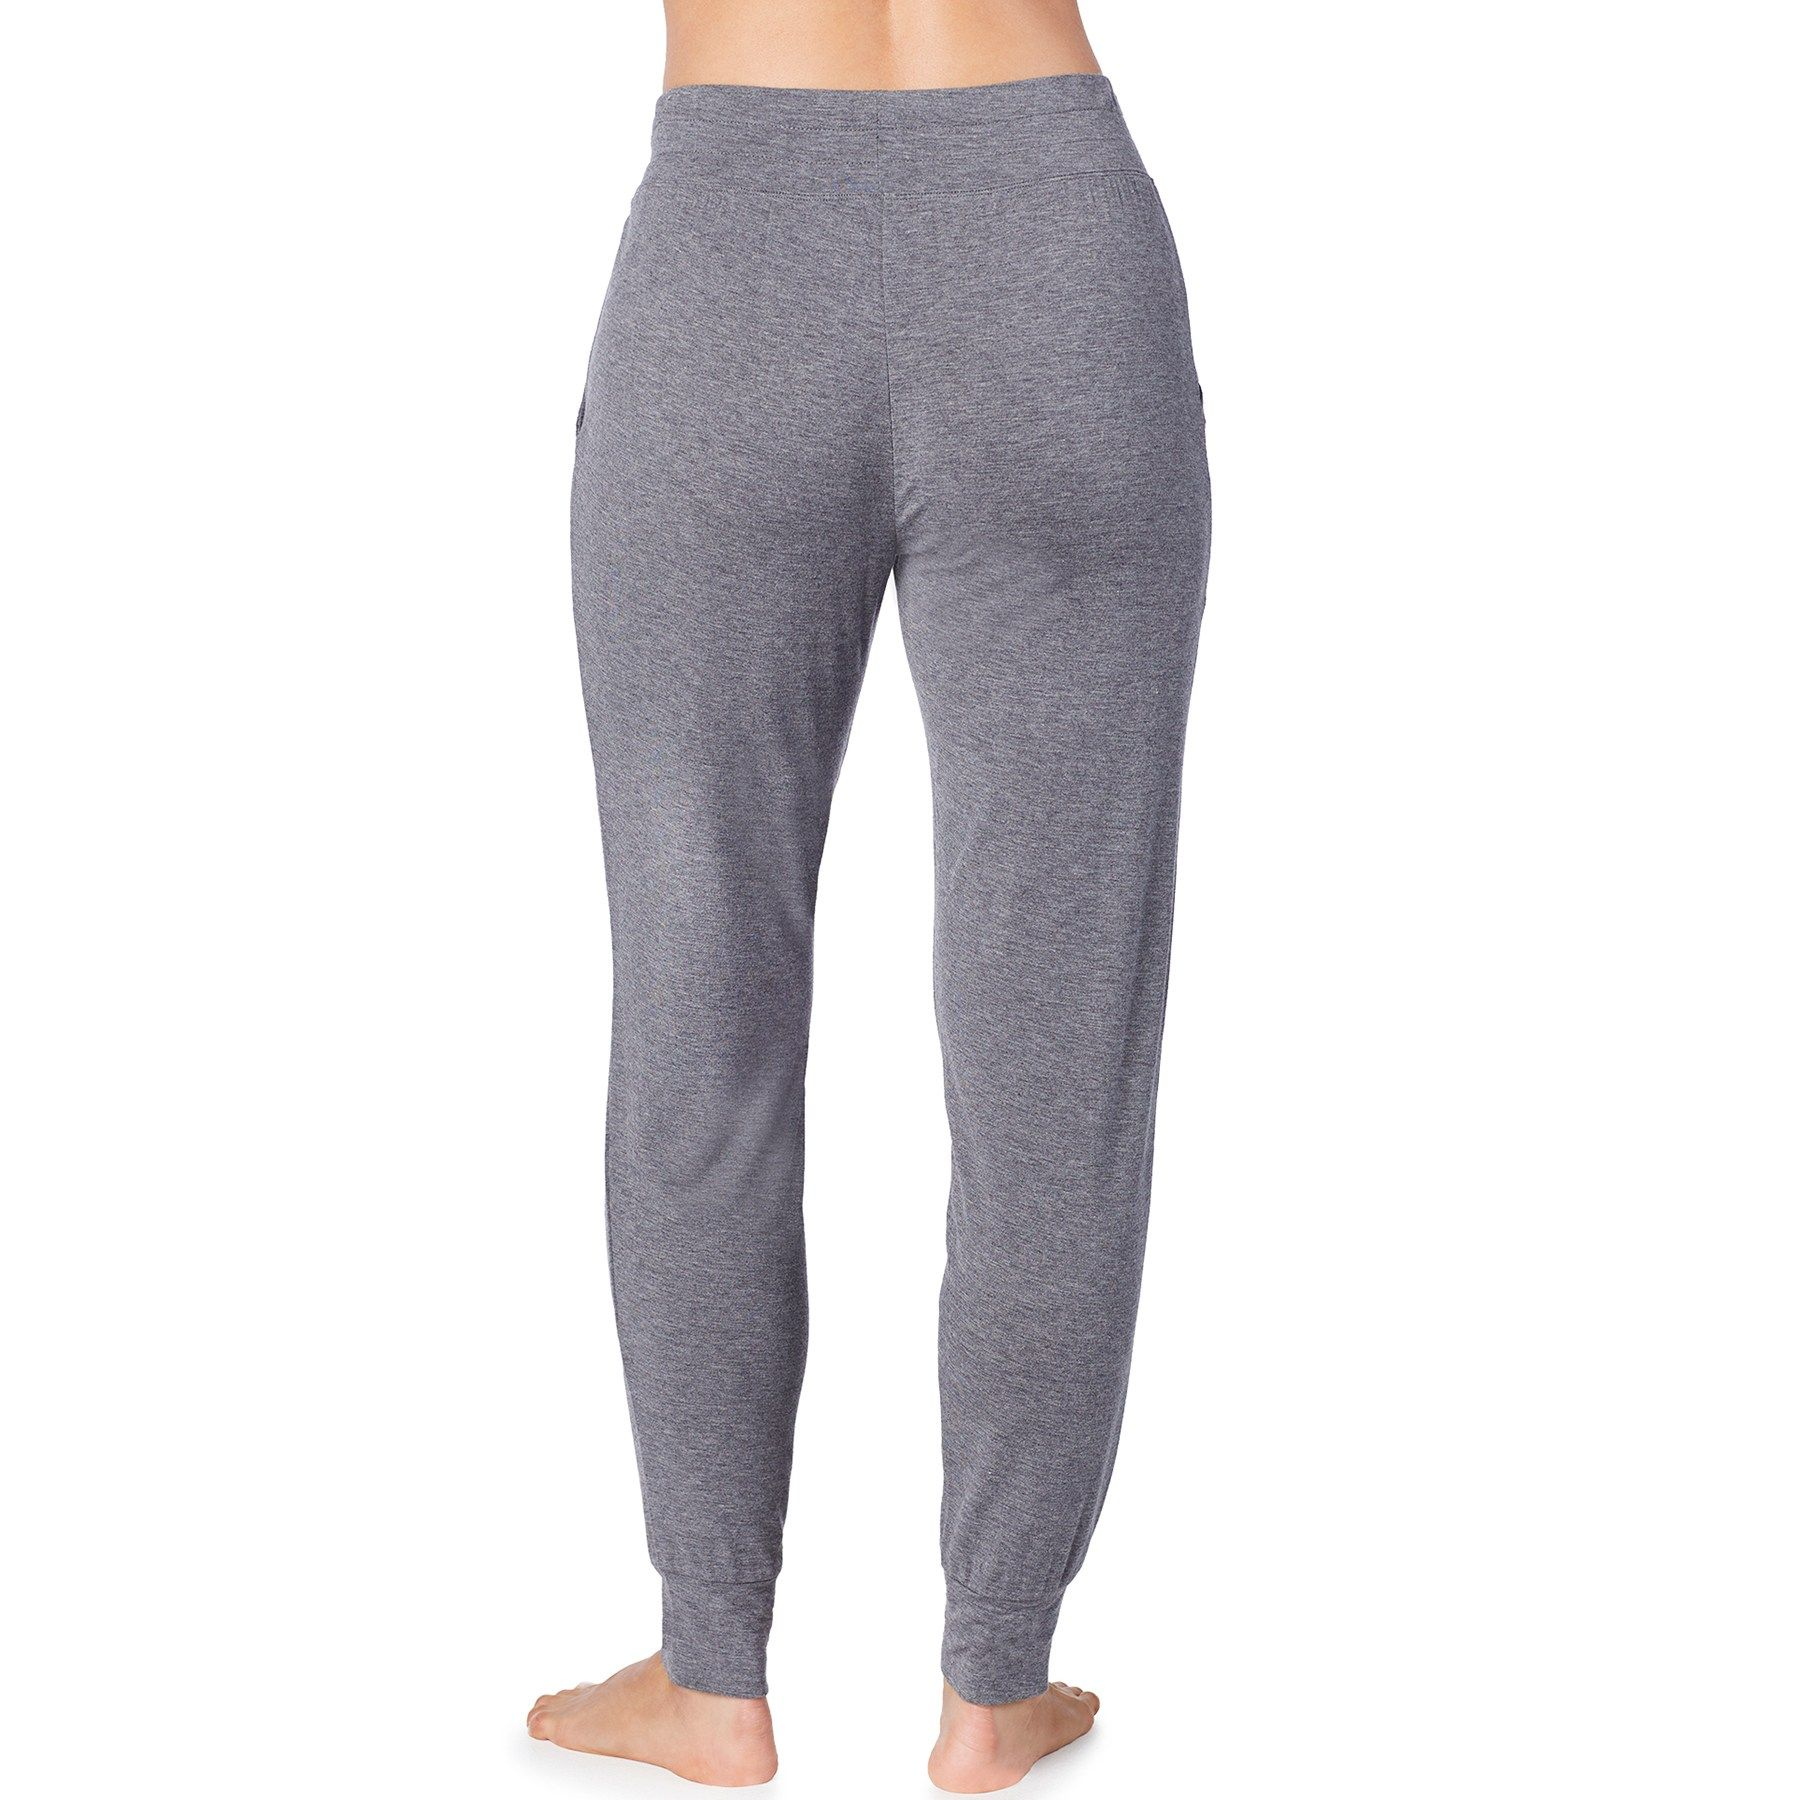 53ad711a27ca8 Women's Cuddl Duds Softwear Stretch Jogger Pants #Duds, #Cuddl, #Women,  #Softwear